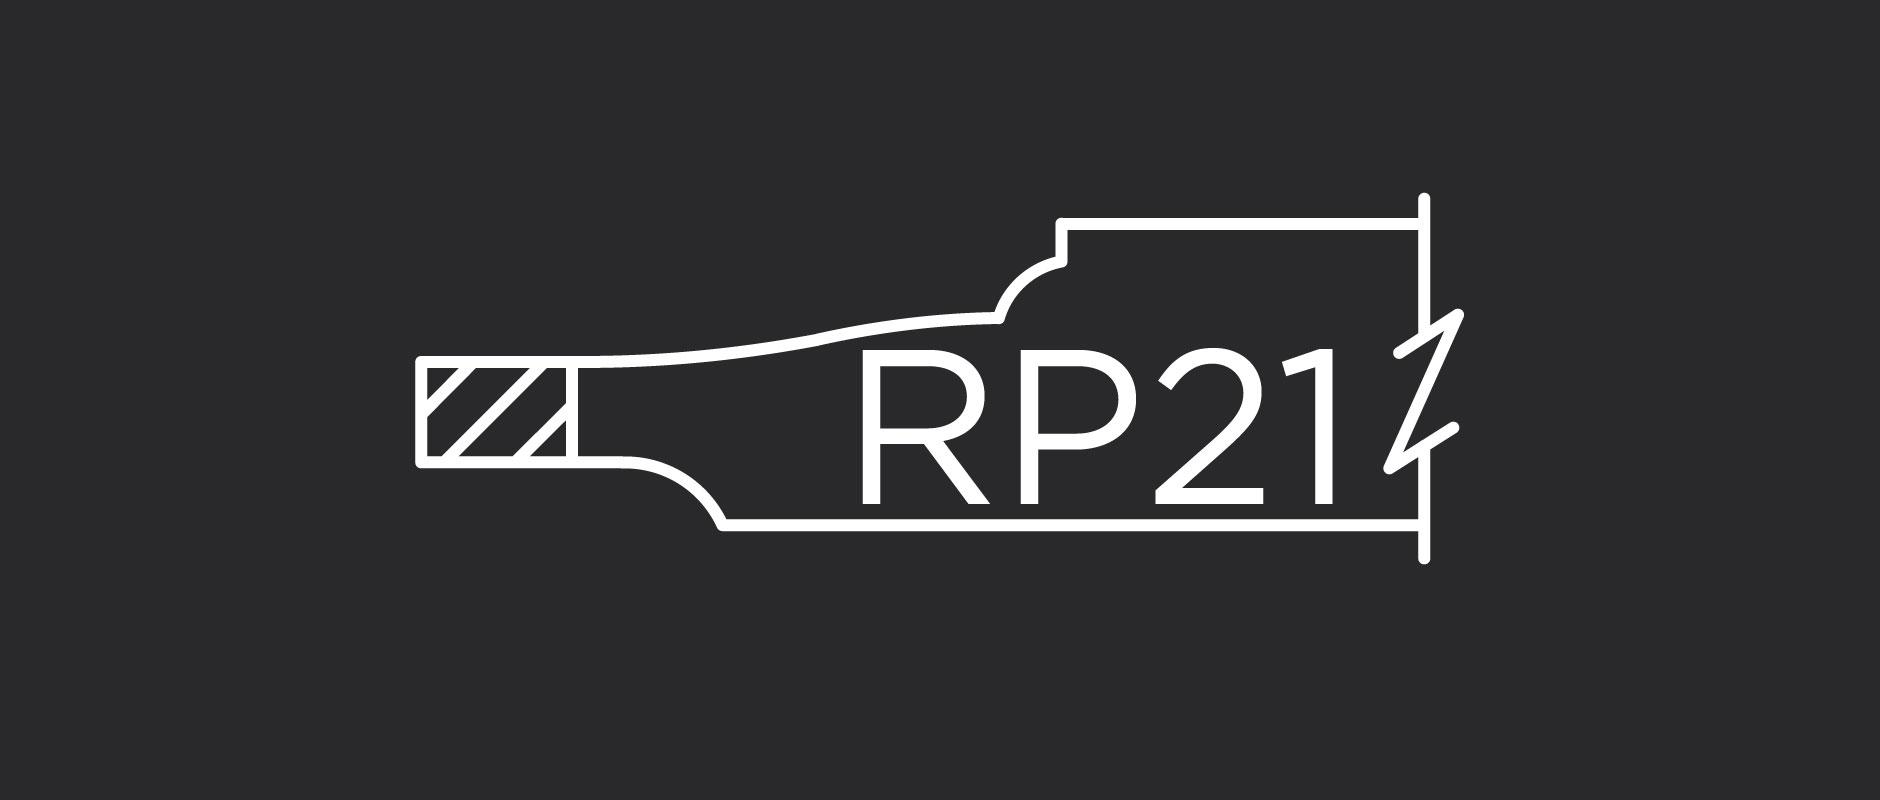 RP21 raised panel profile